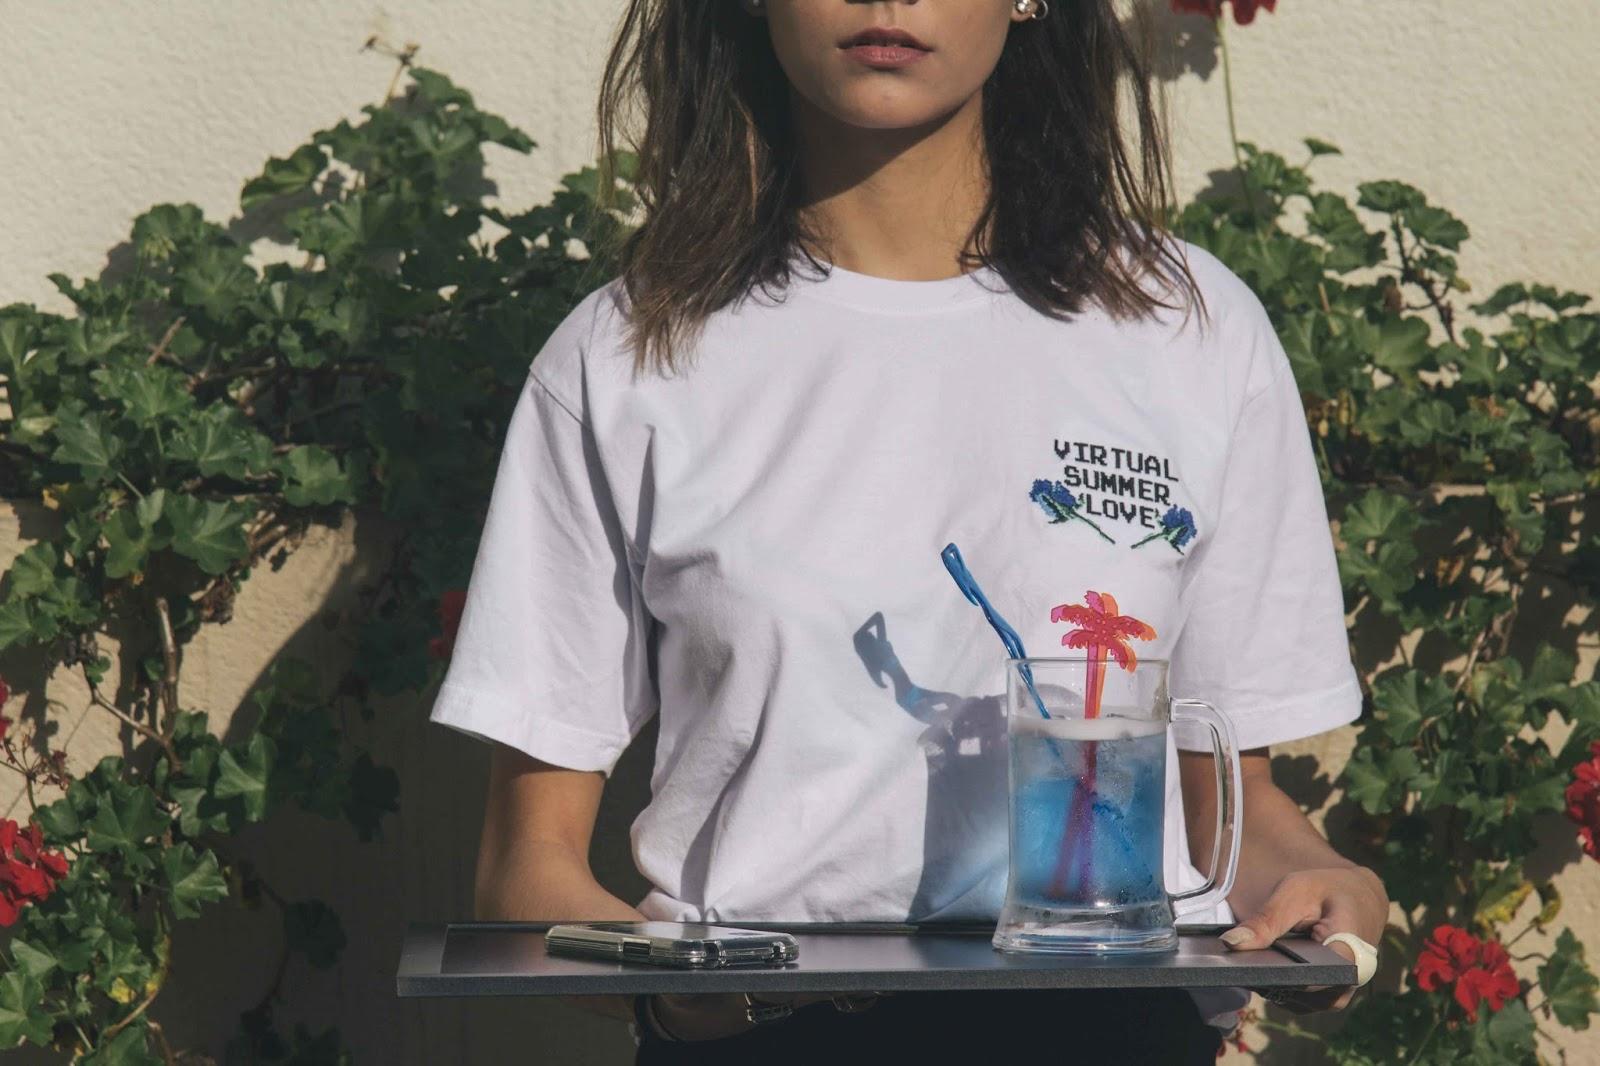 supatramp streetwear brasil 01 - Conheça a marca brasileira Supatramp